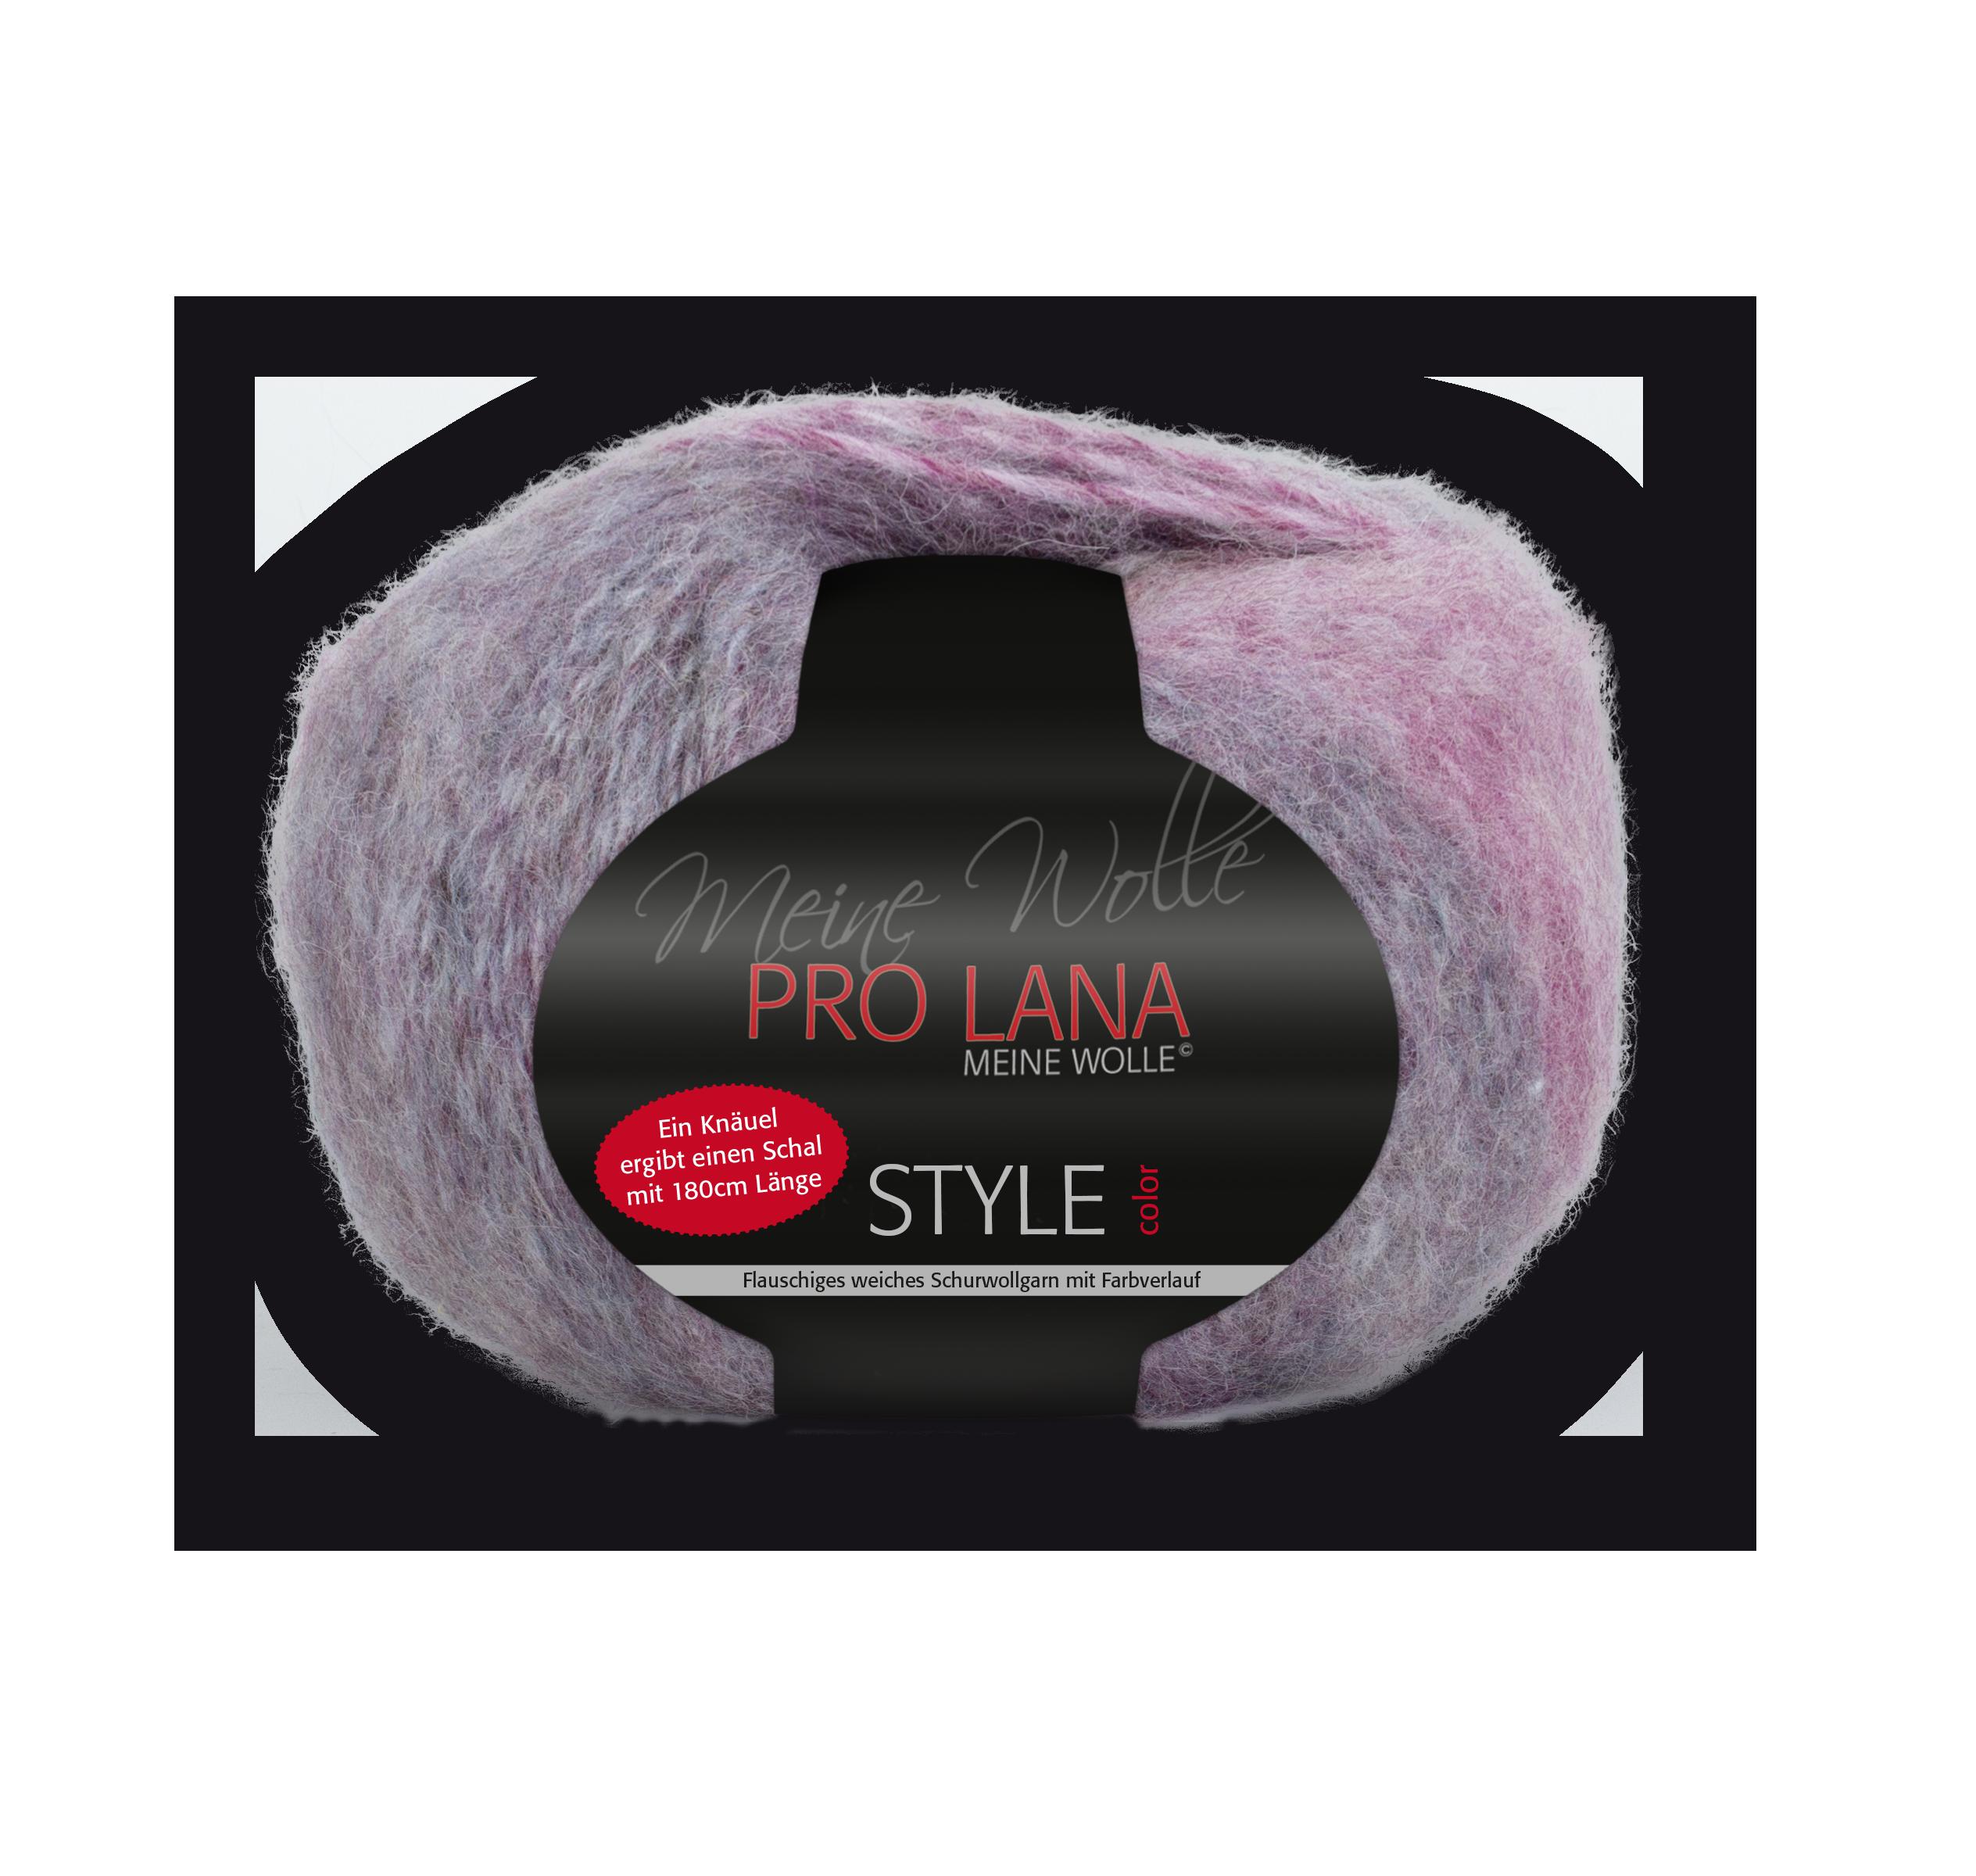 Pro Lana Style 150g. Sort. 3,75kg